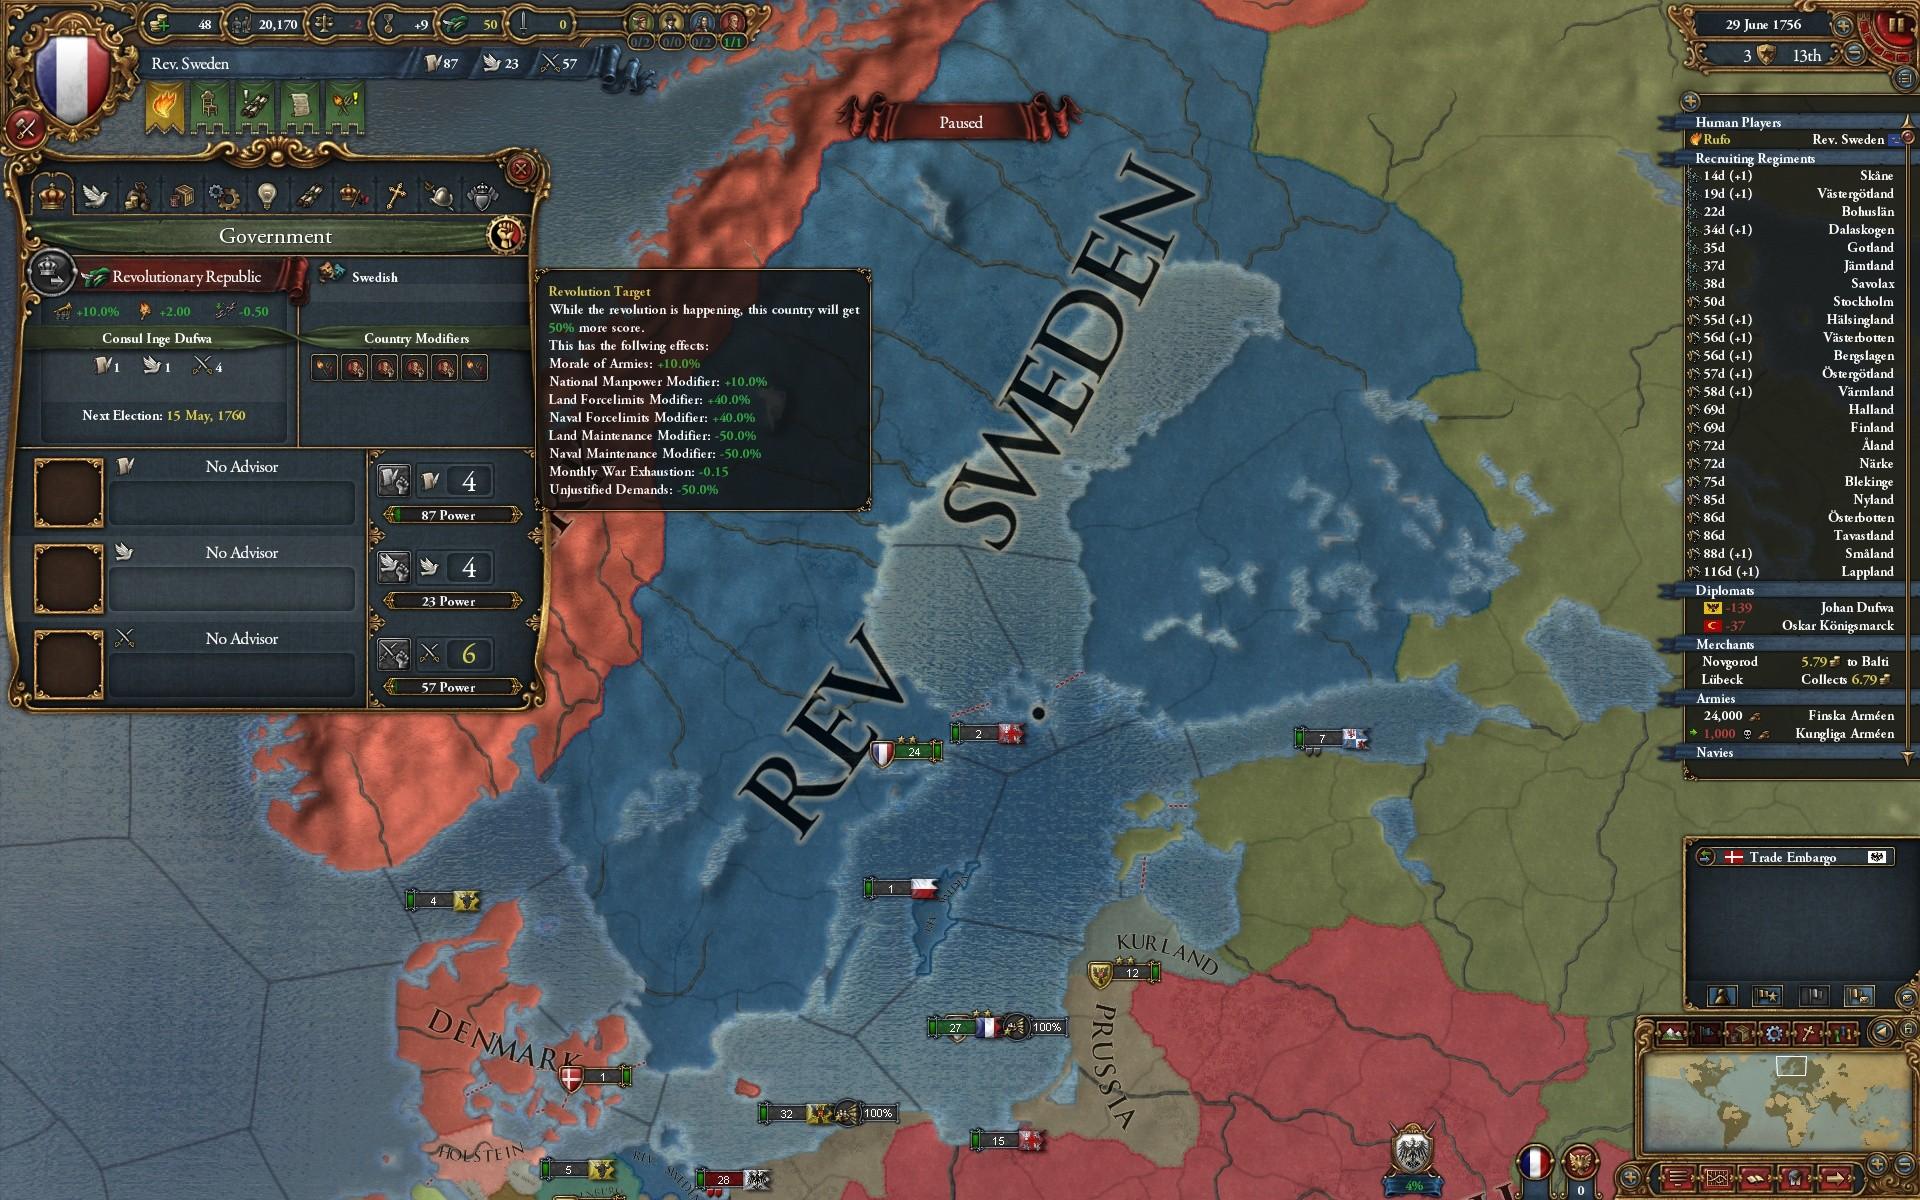 Europa Universalis Iv Art Of War Adds New Start Date